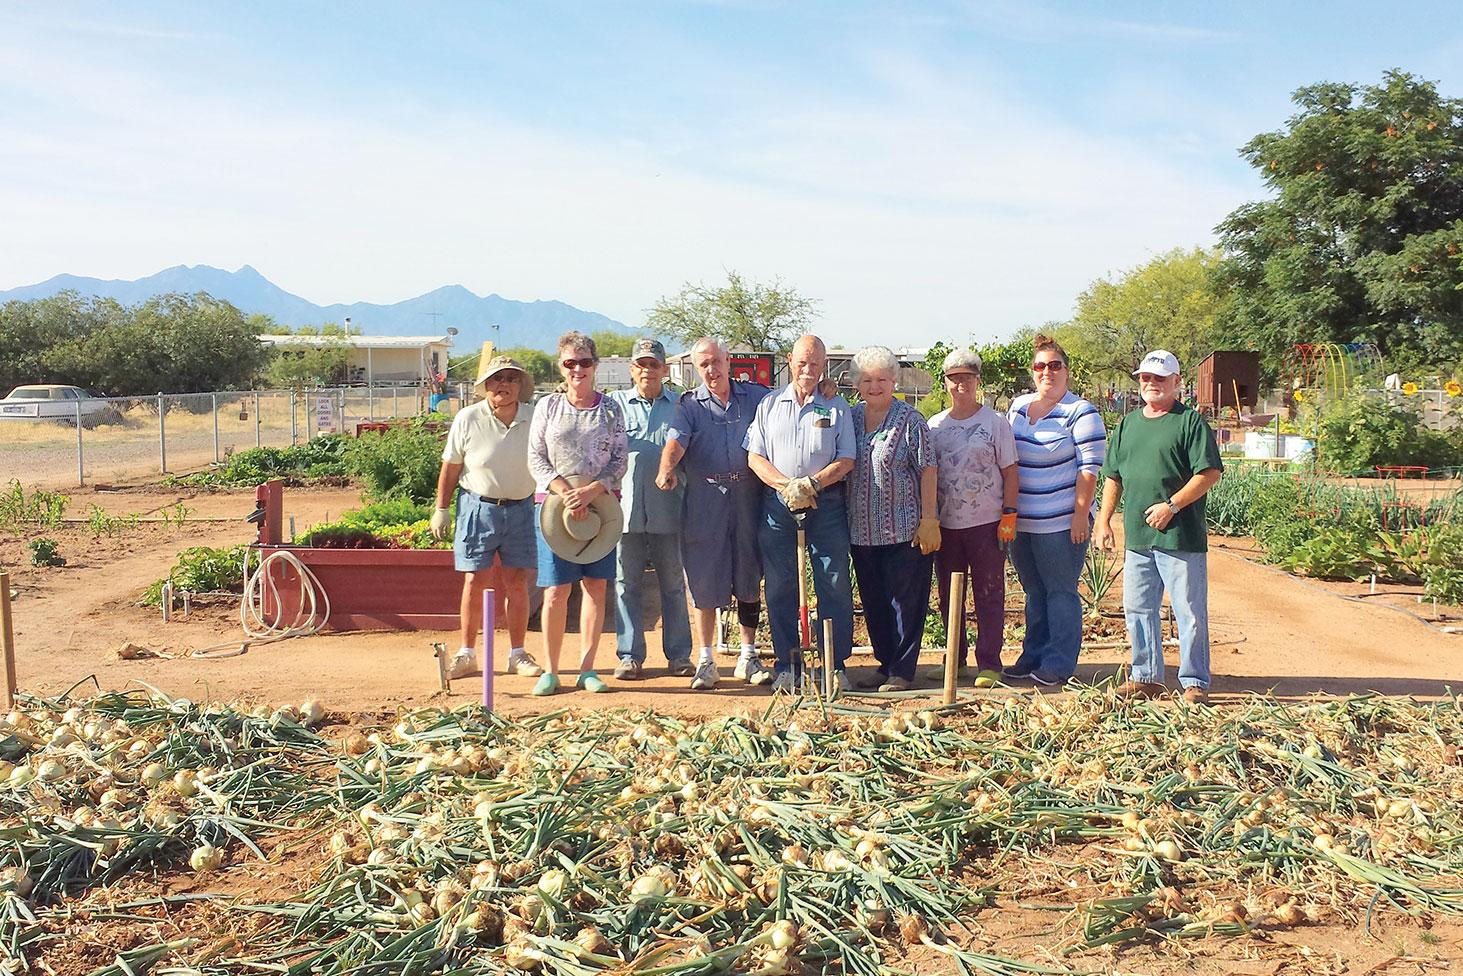 Proud Quail Creek gardeners view their bumper crop.